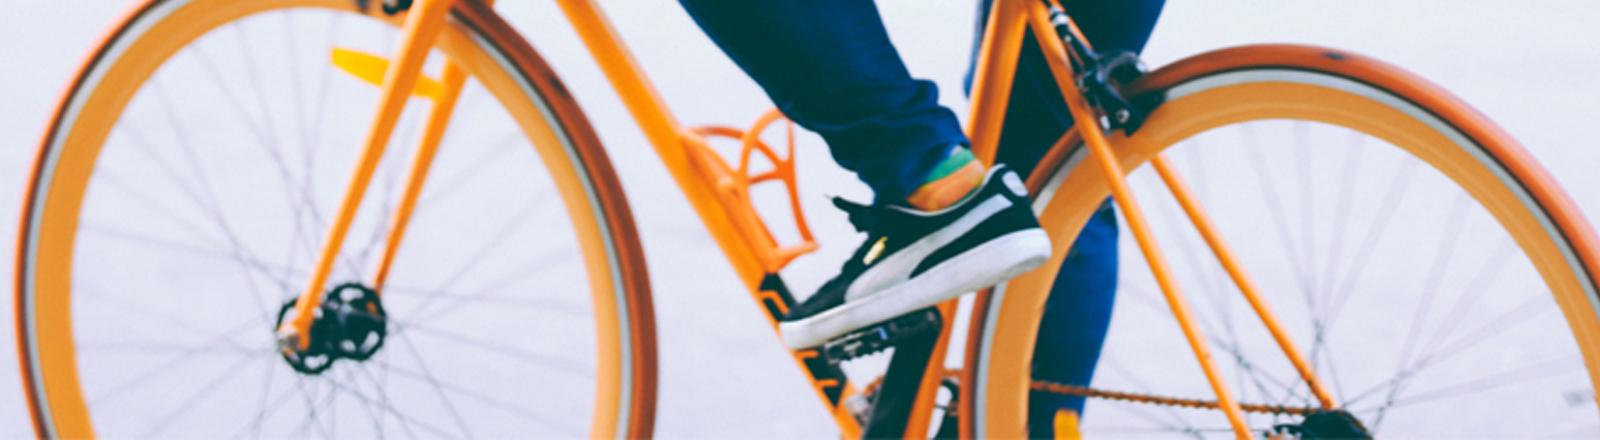 Radfahrer auf orangem Fahrrad